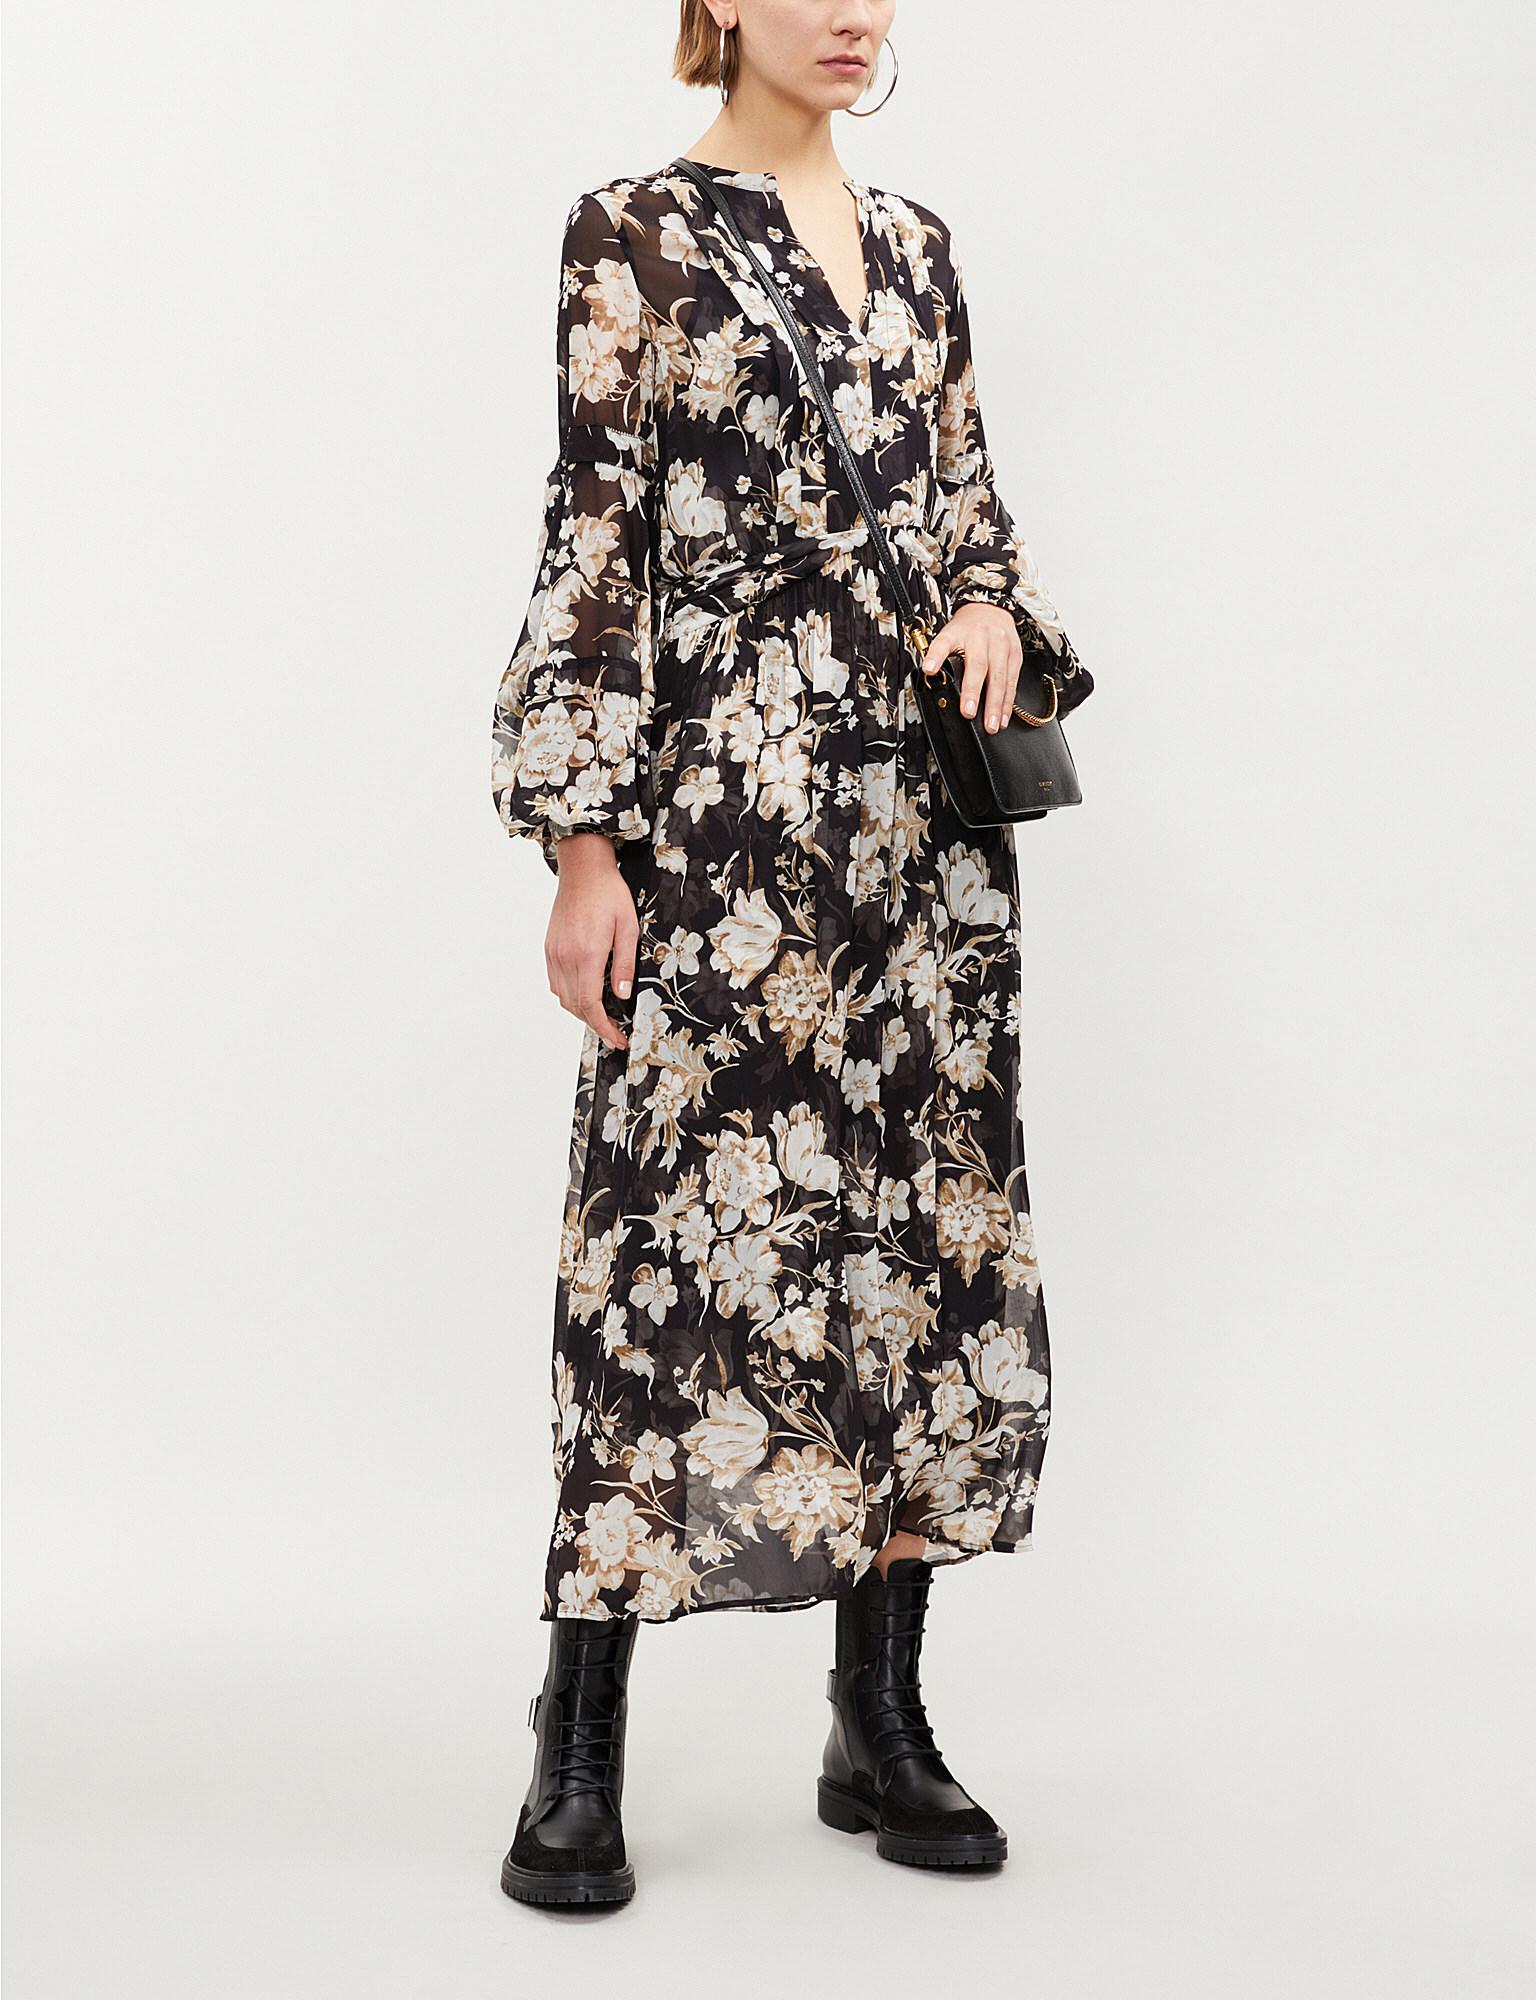 624c91d07f The Kooples Floral-print Crepe Midi Dress in Black - Lyst